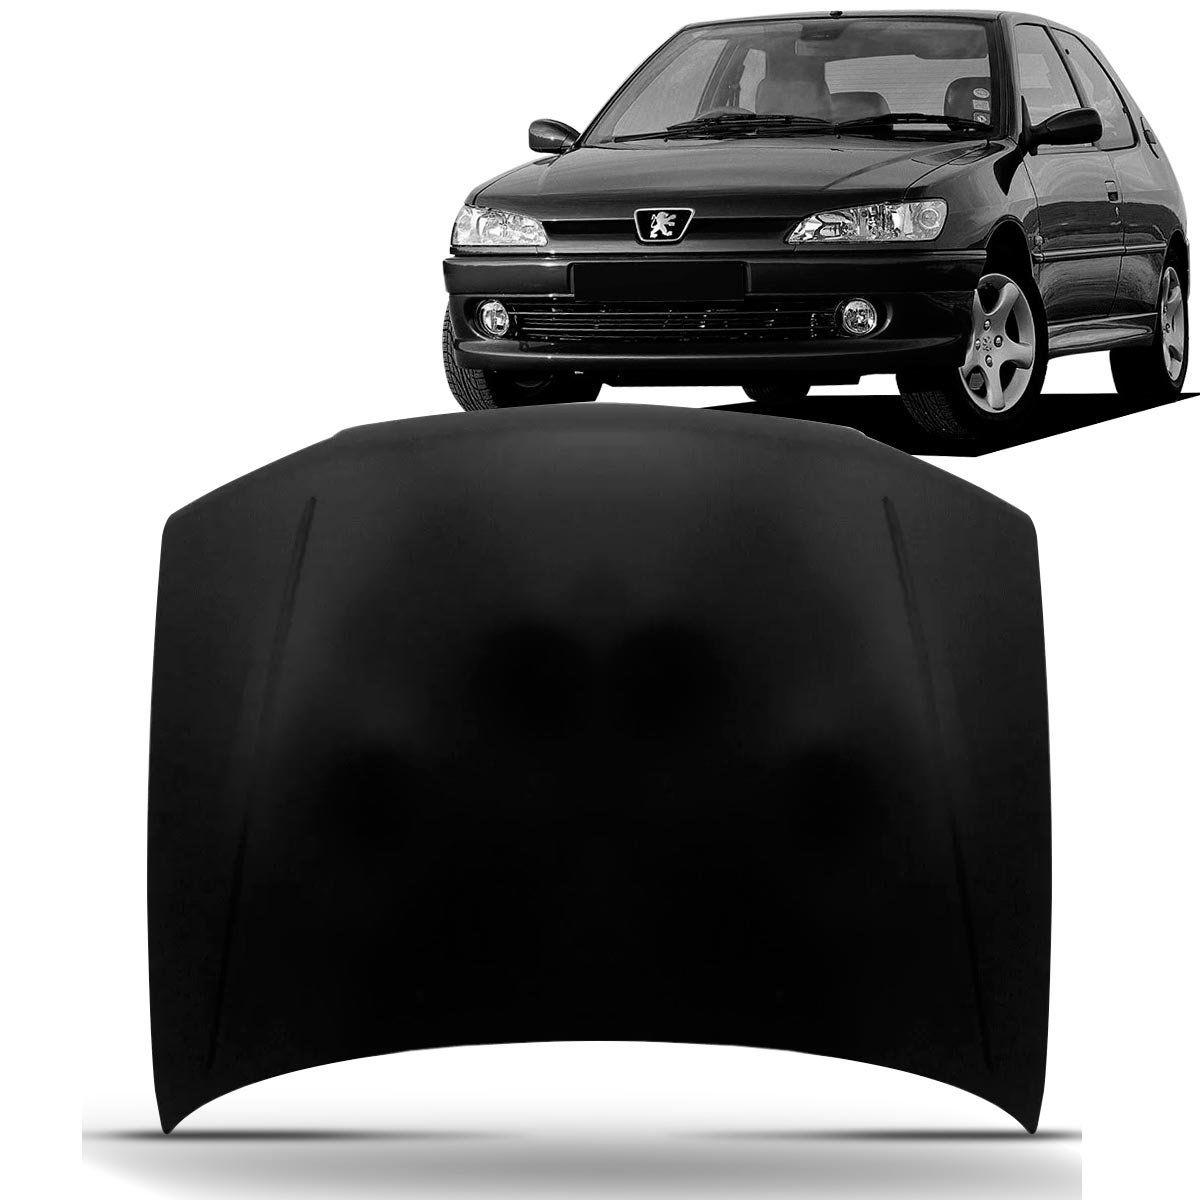 Capo Peugeot 306 99 2000 2001